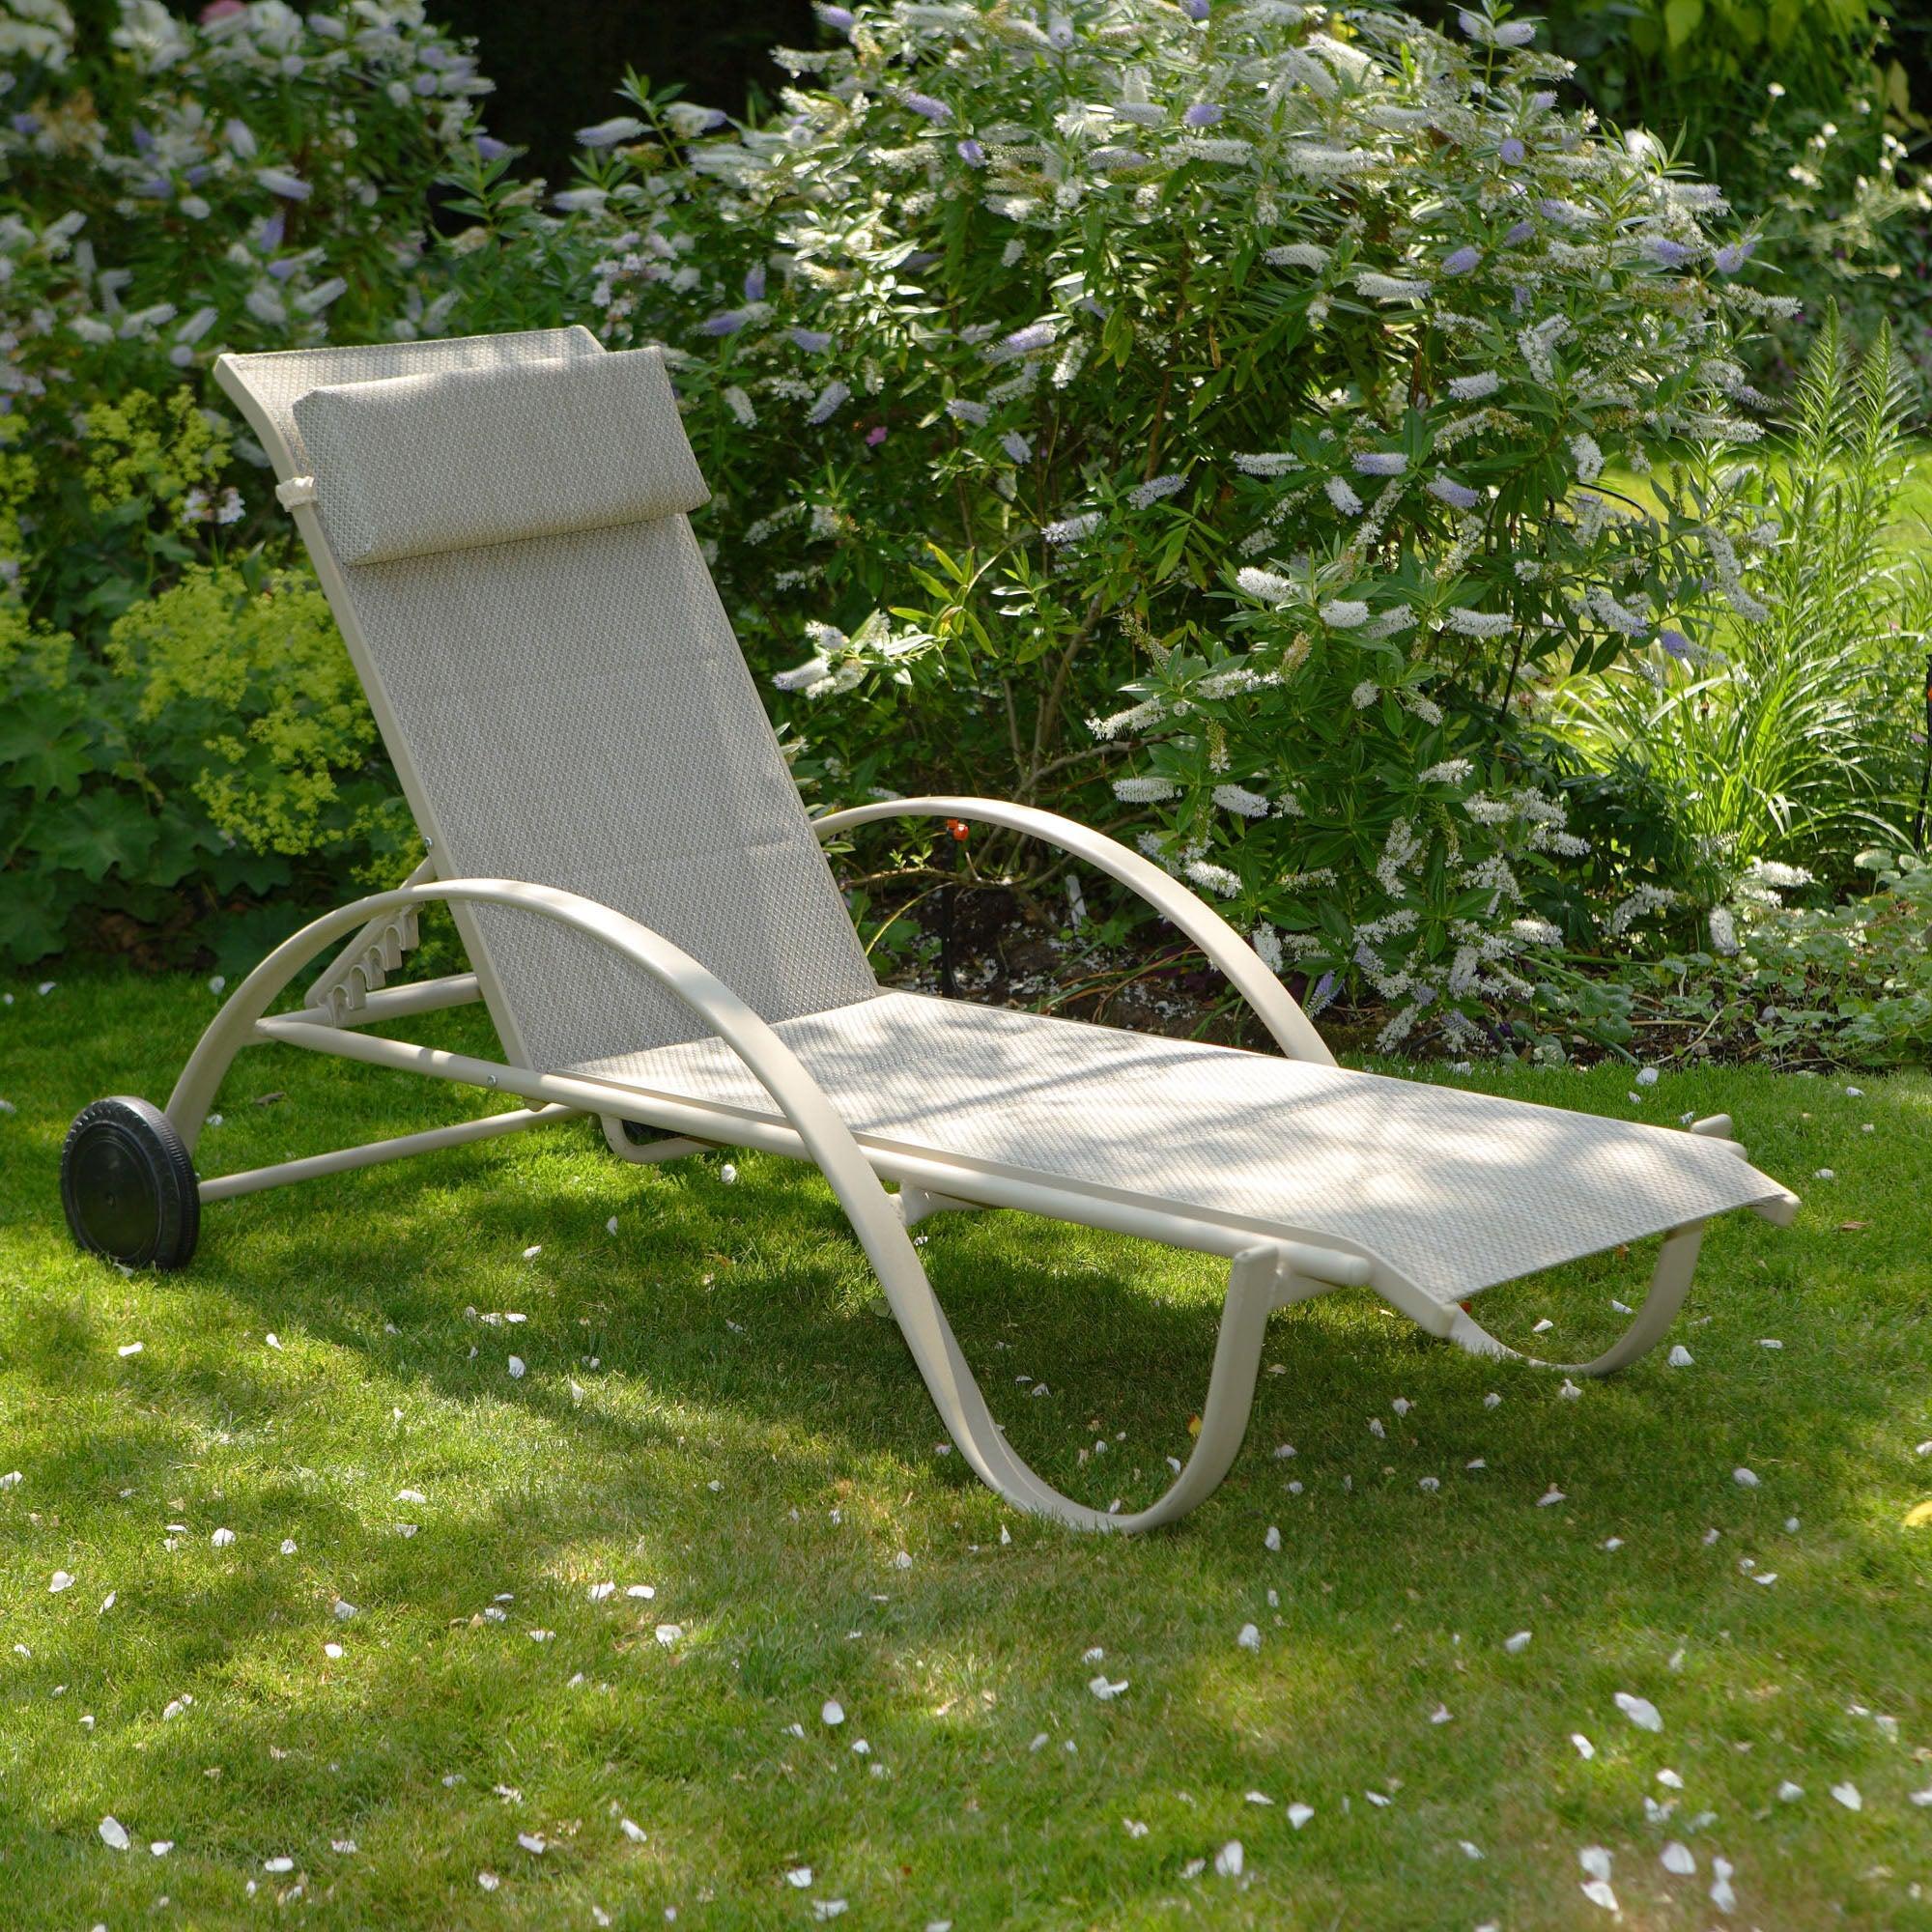 Tudor Wheeled Lounger